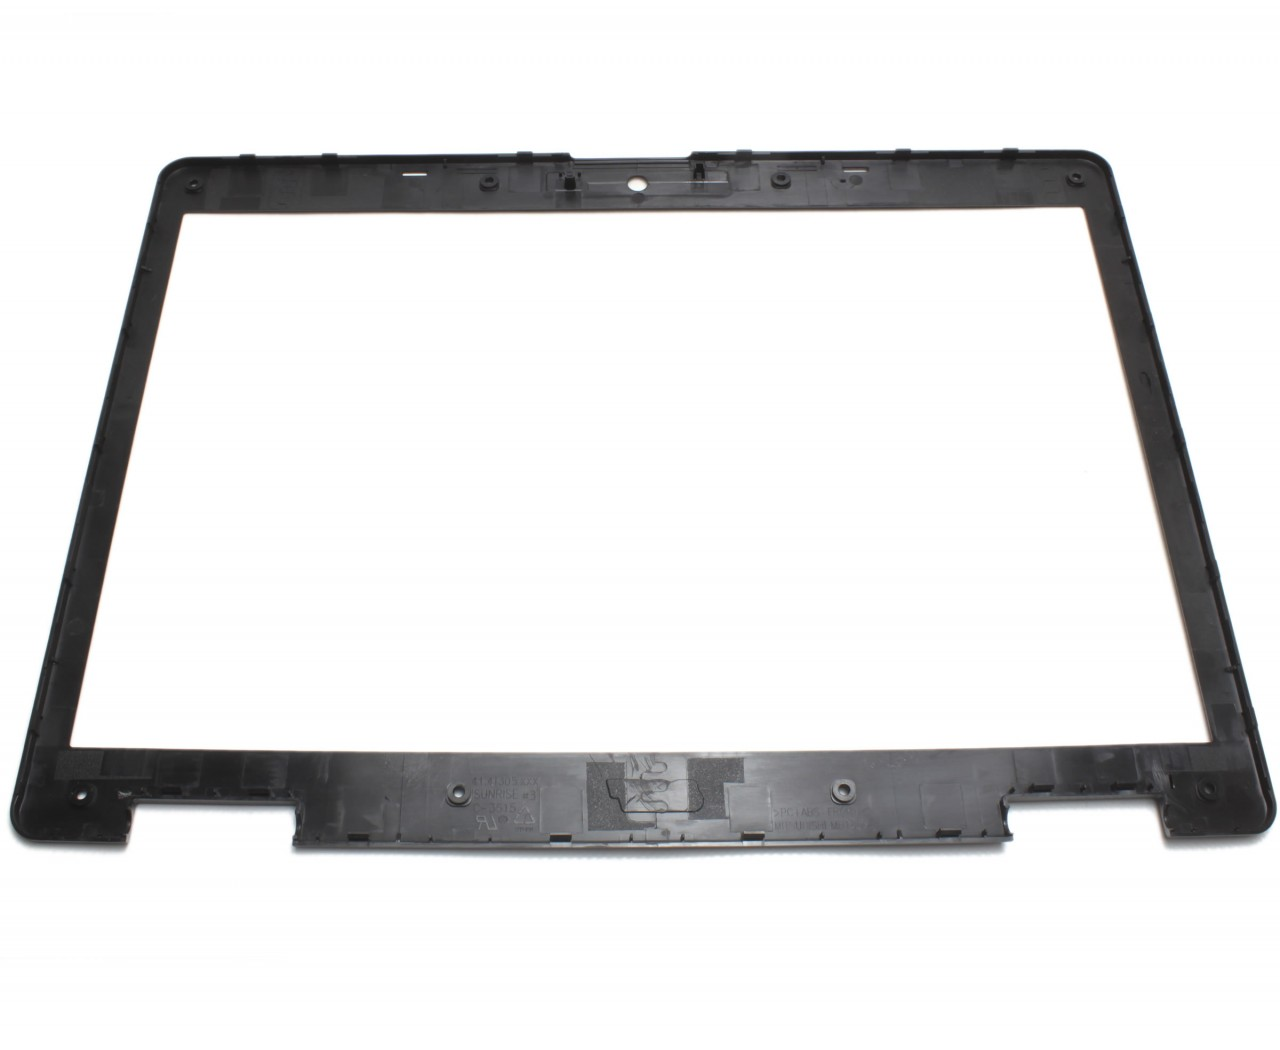 Rama Display Acer TravelMate 5710 Bezel Front Cover Neagra imagine